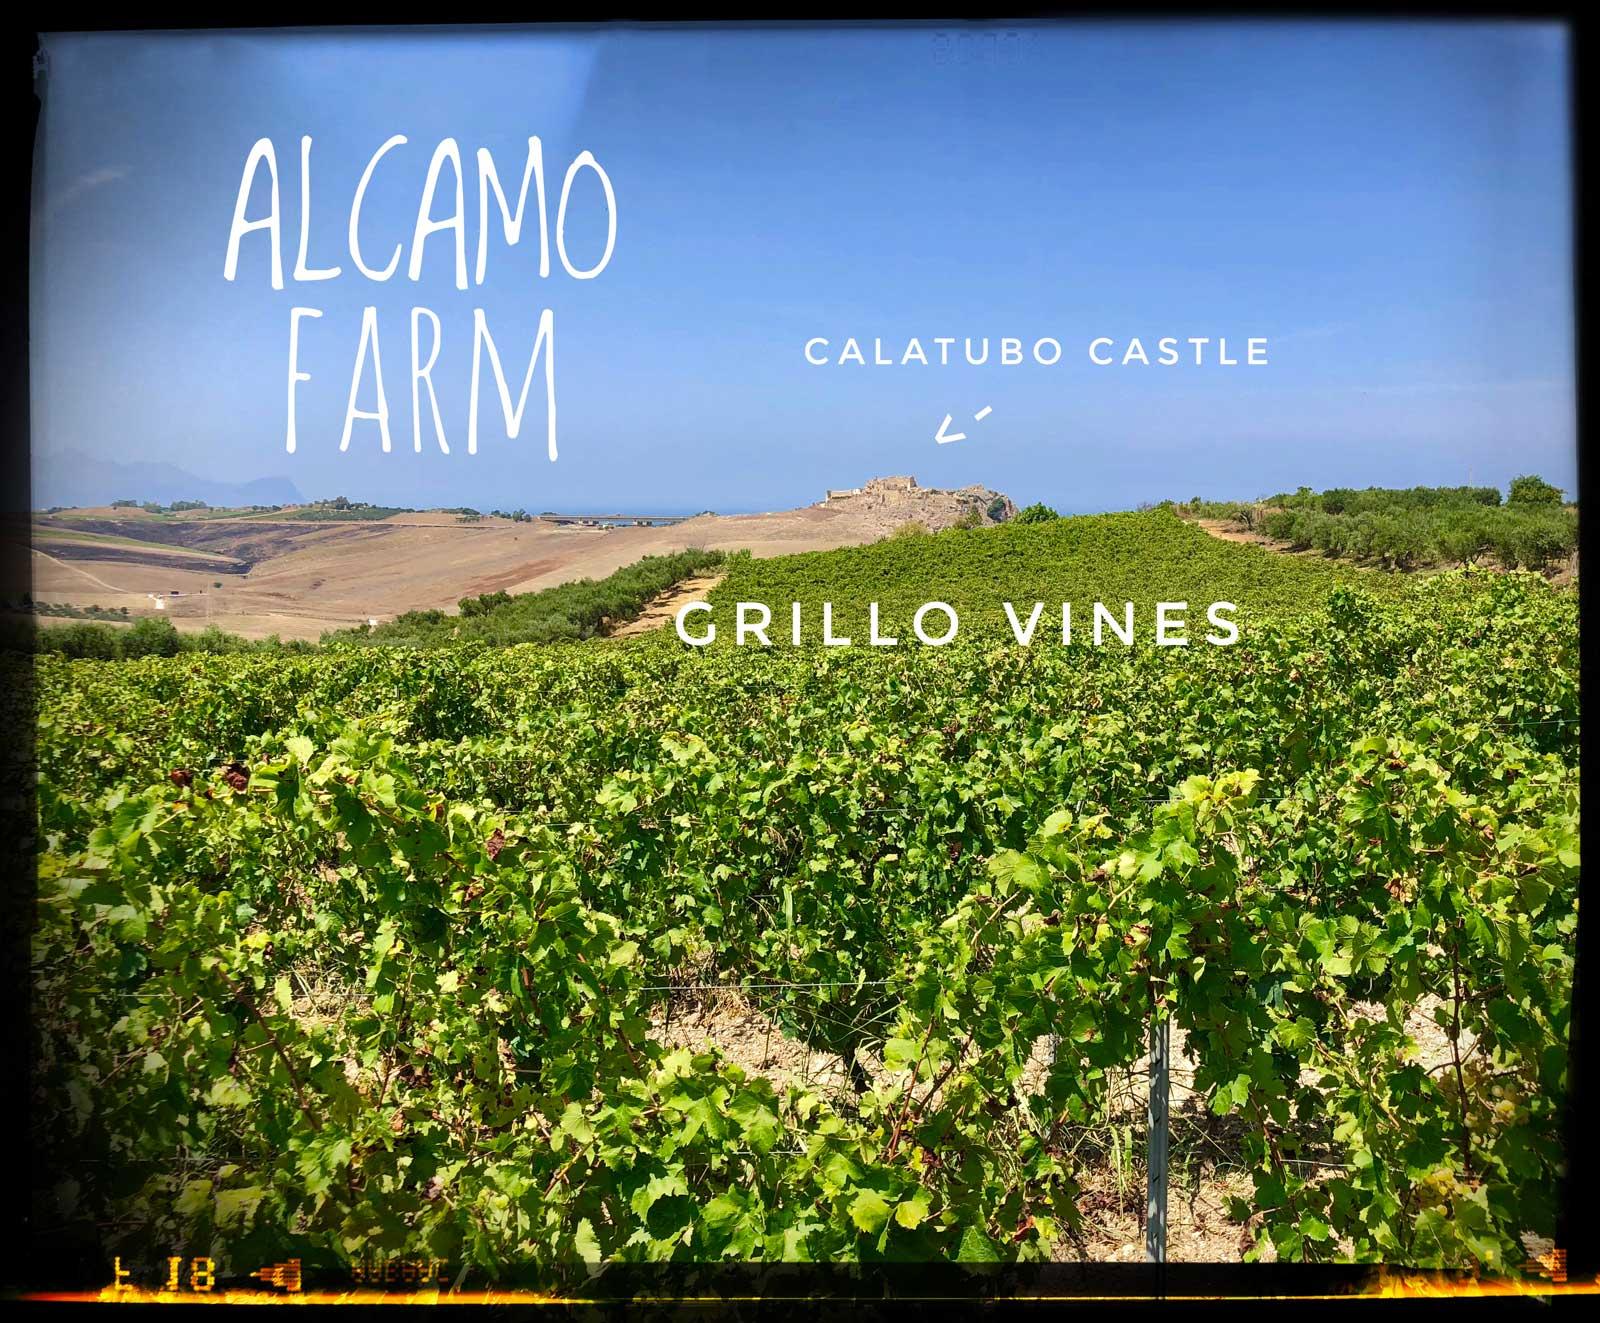 alcamo_farm_crop.jpg